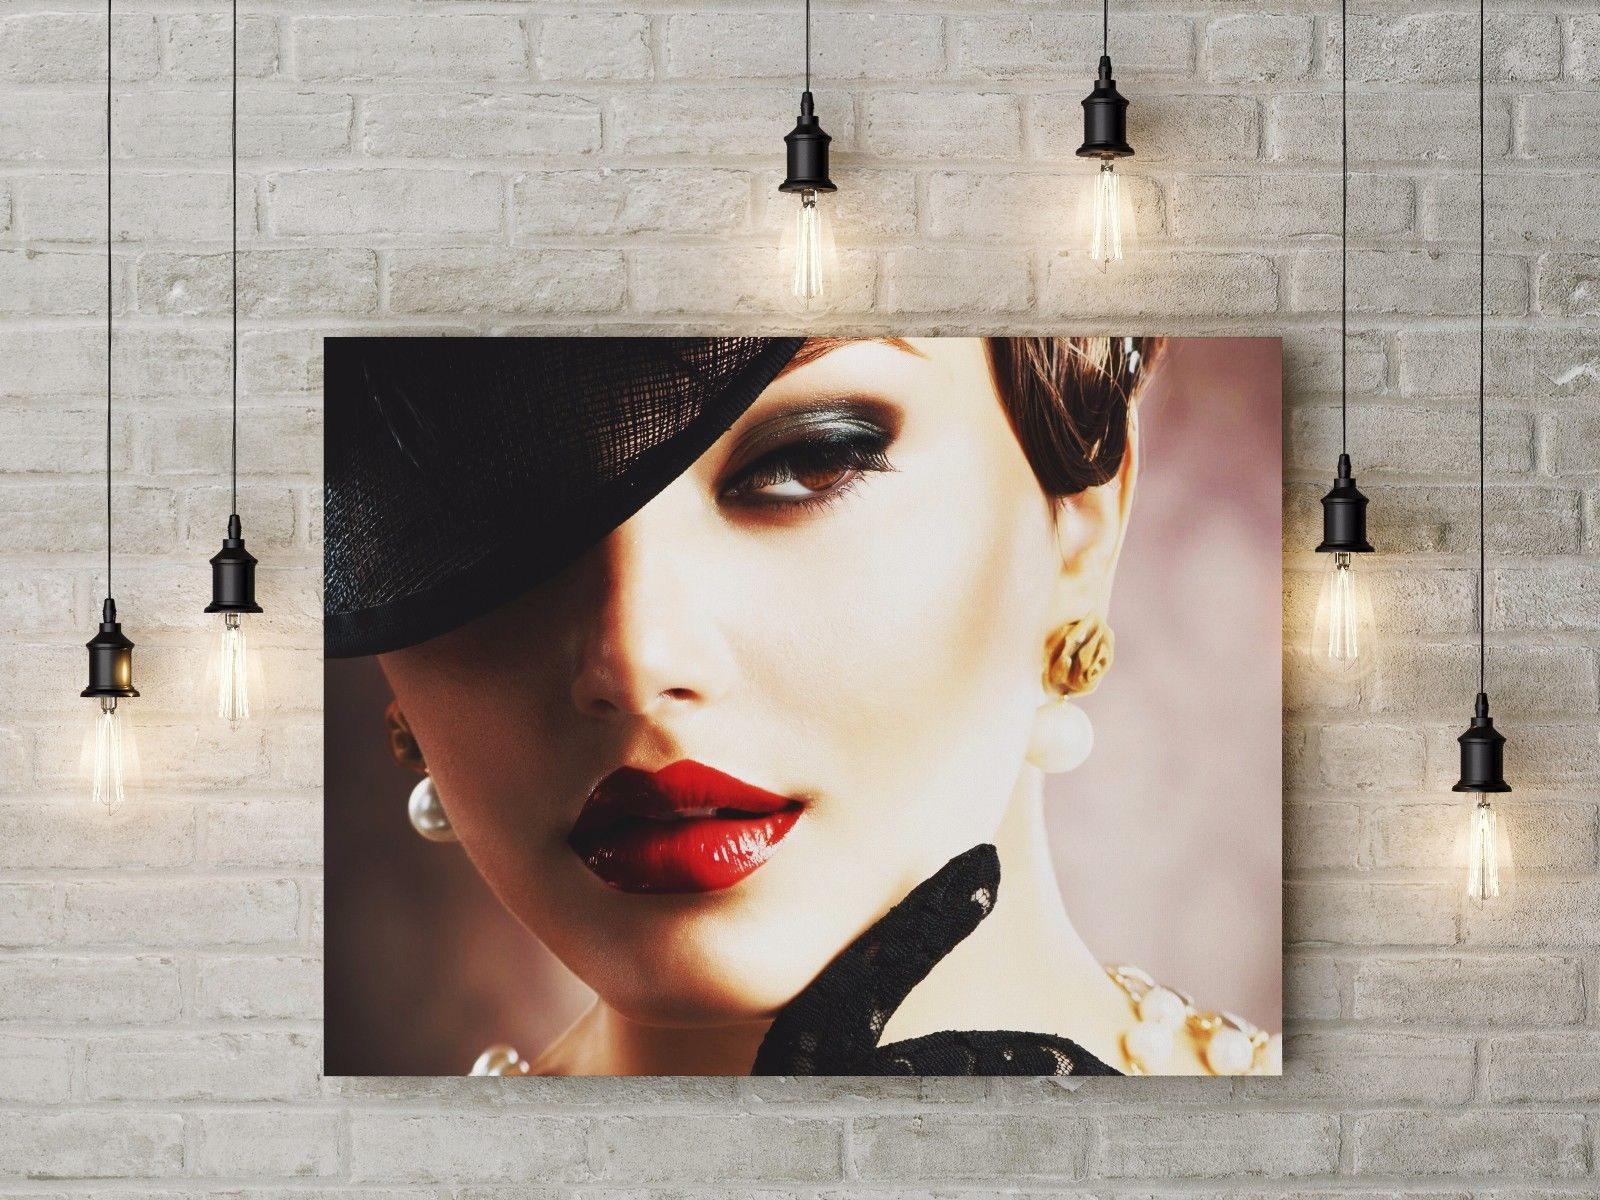 120429 Fashion Design Beautytyle Girl Vintagealo Makeup WALL PRINT POSTER AU